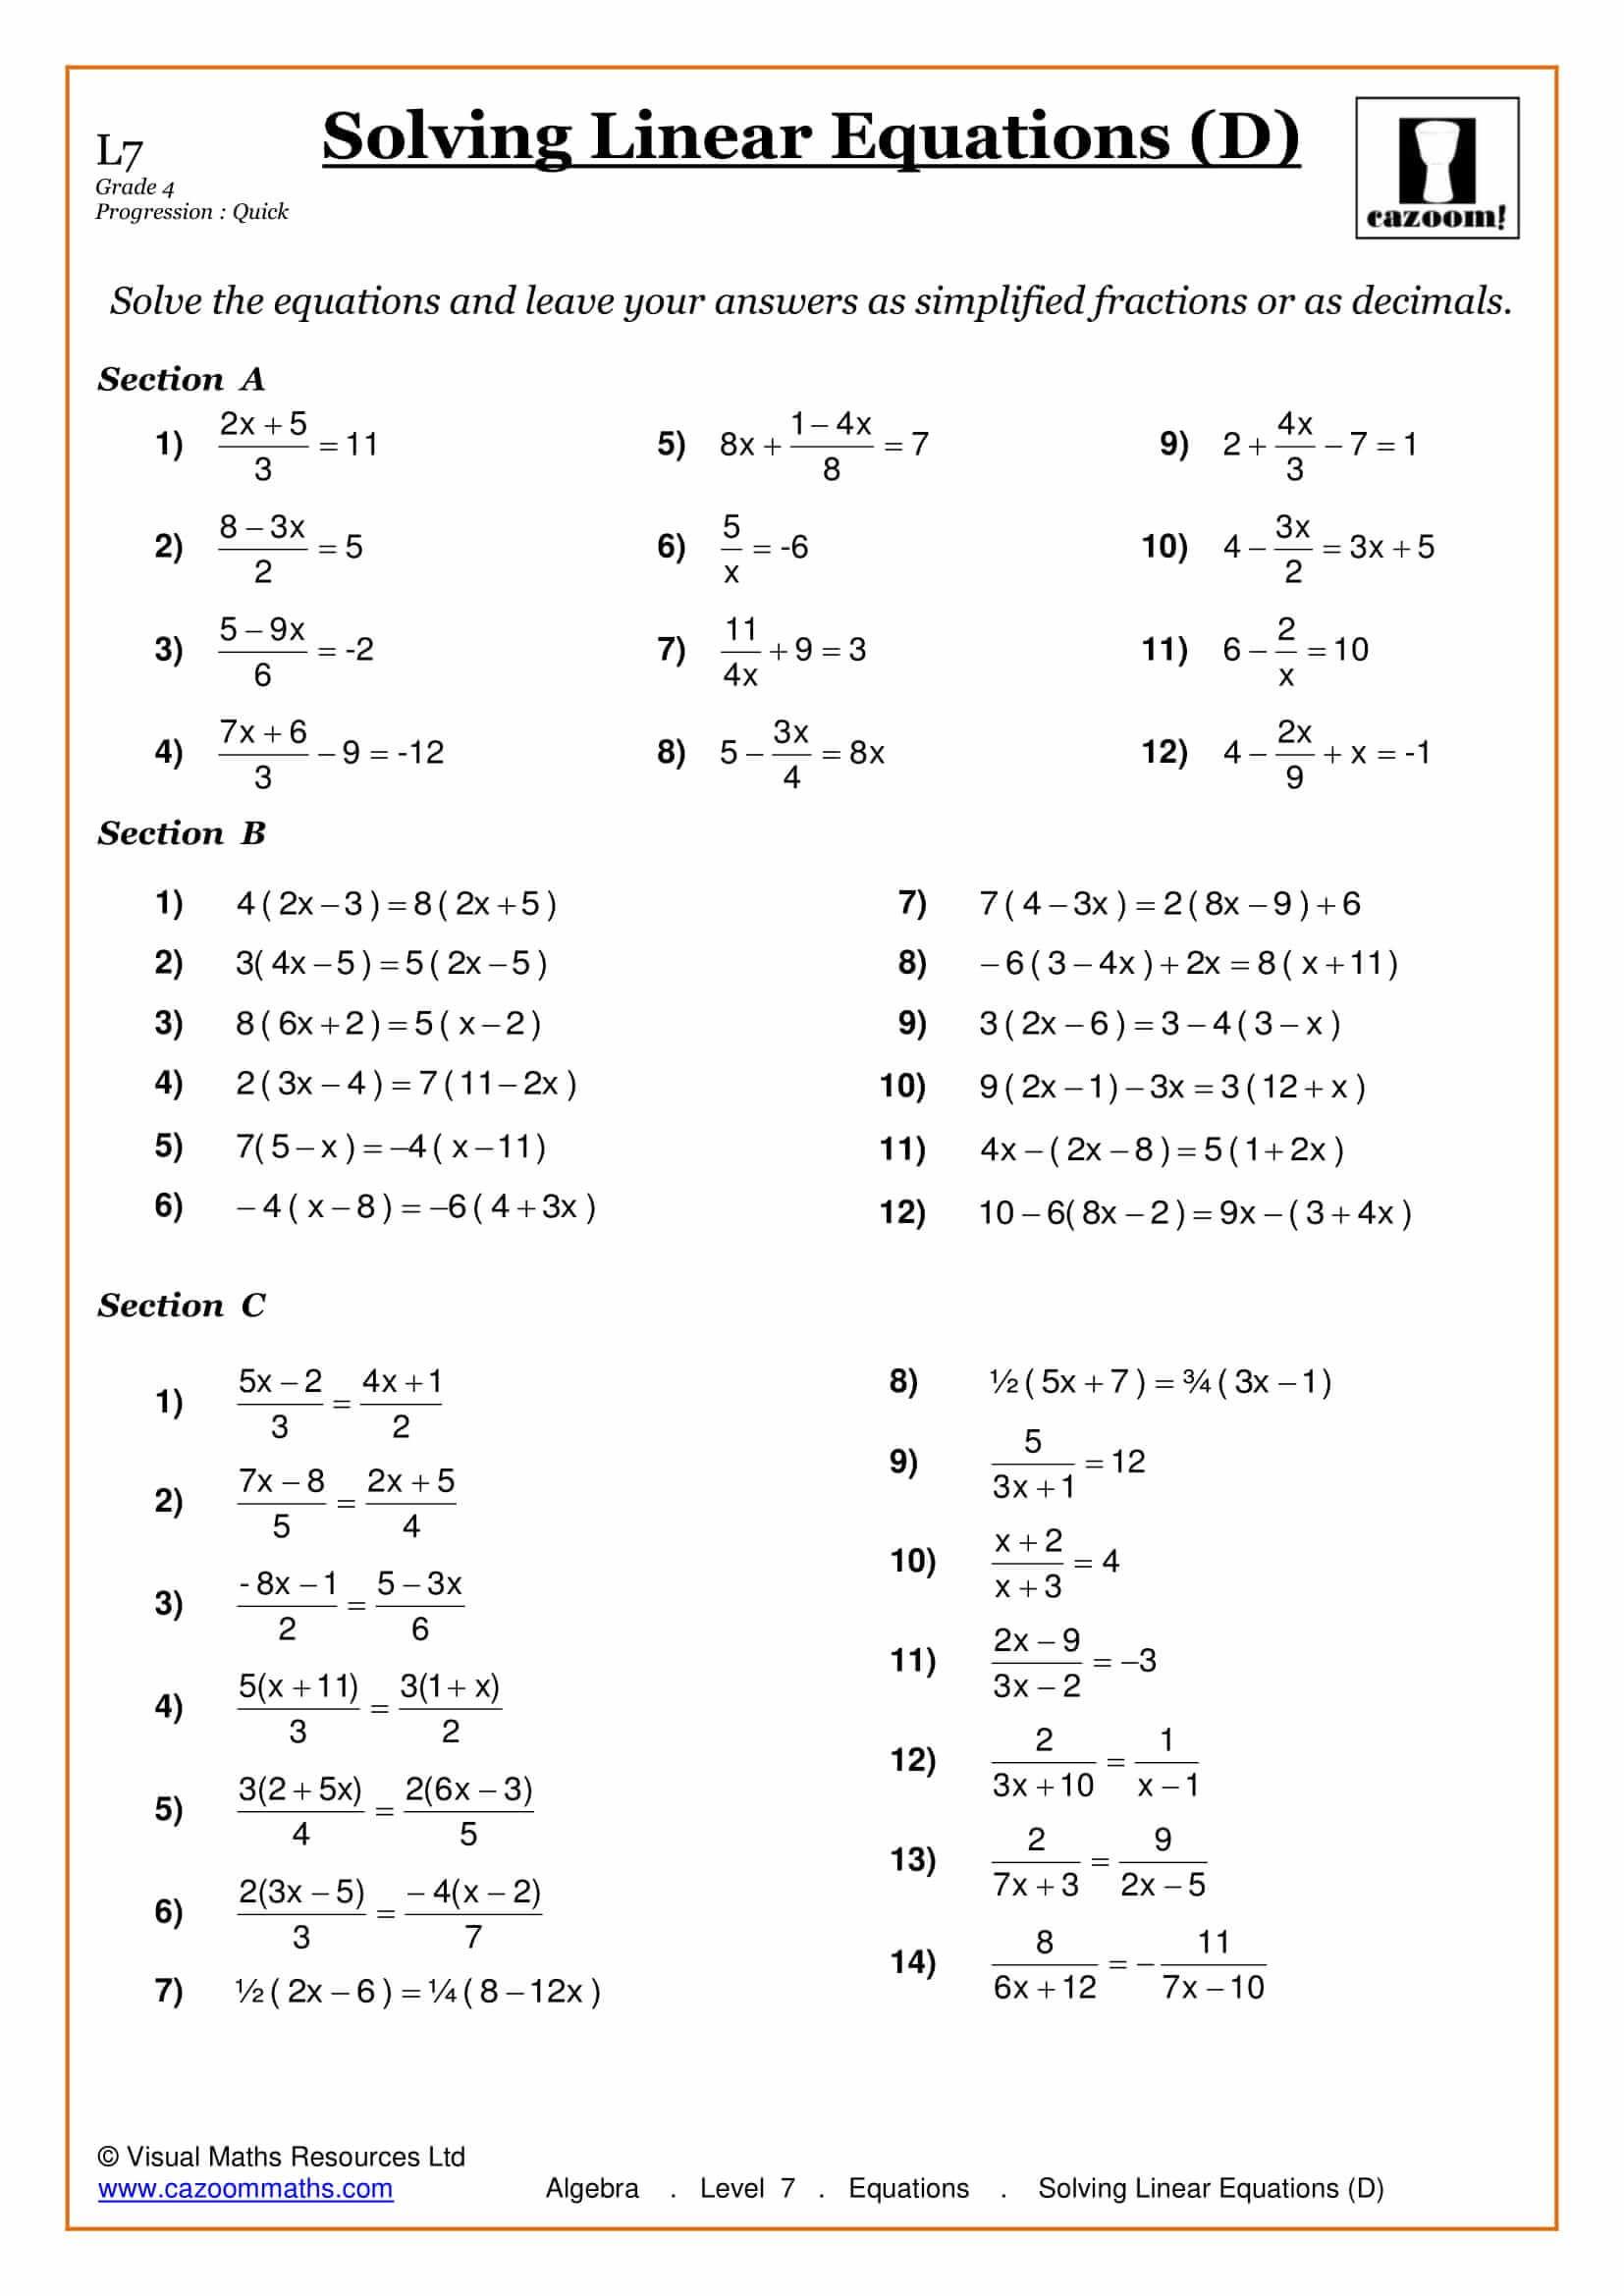 medium resolution of Solving Equations Maths Worksheet - cazoommaths.com   Algebra worksheets